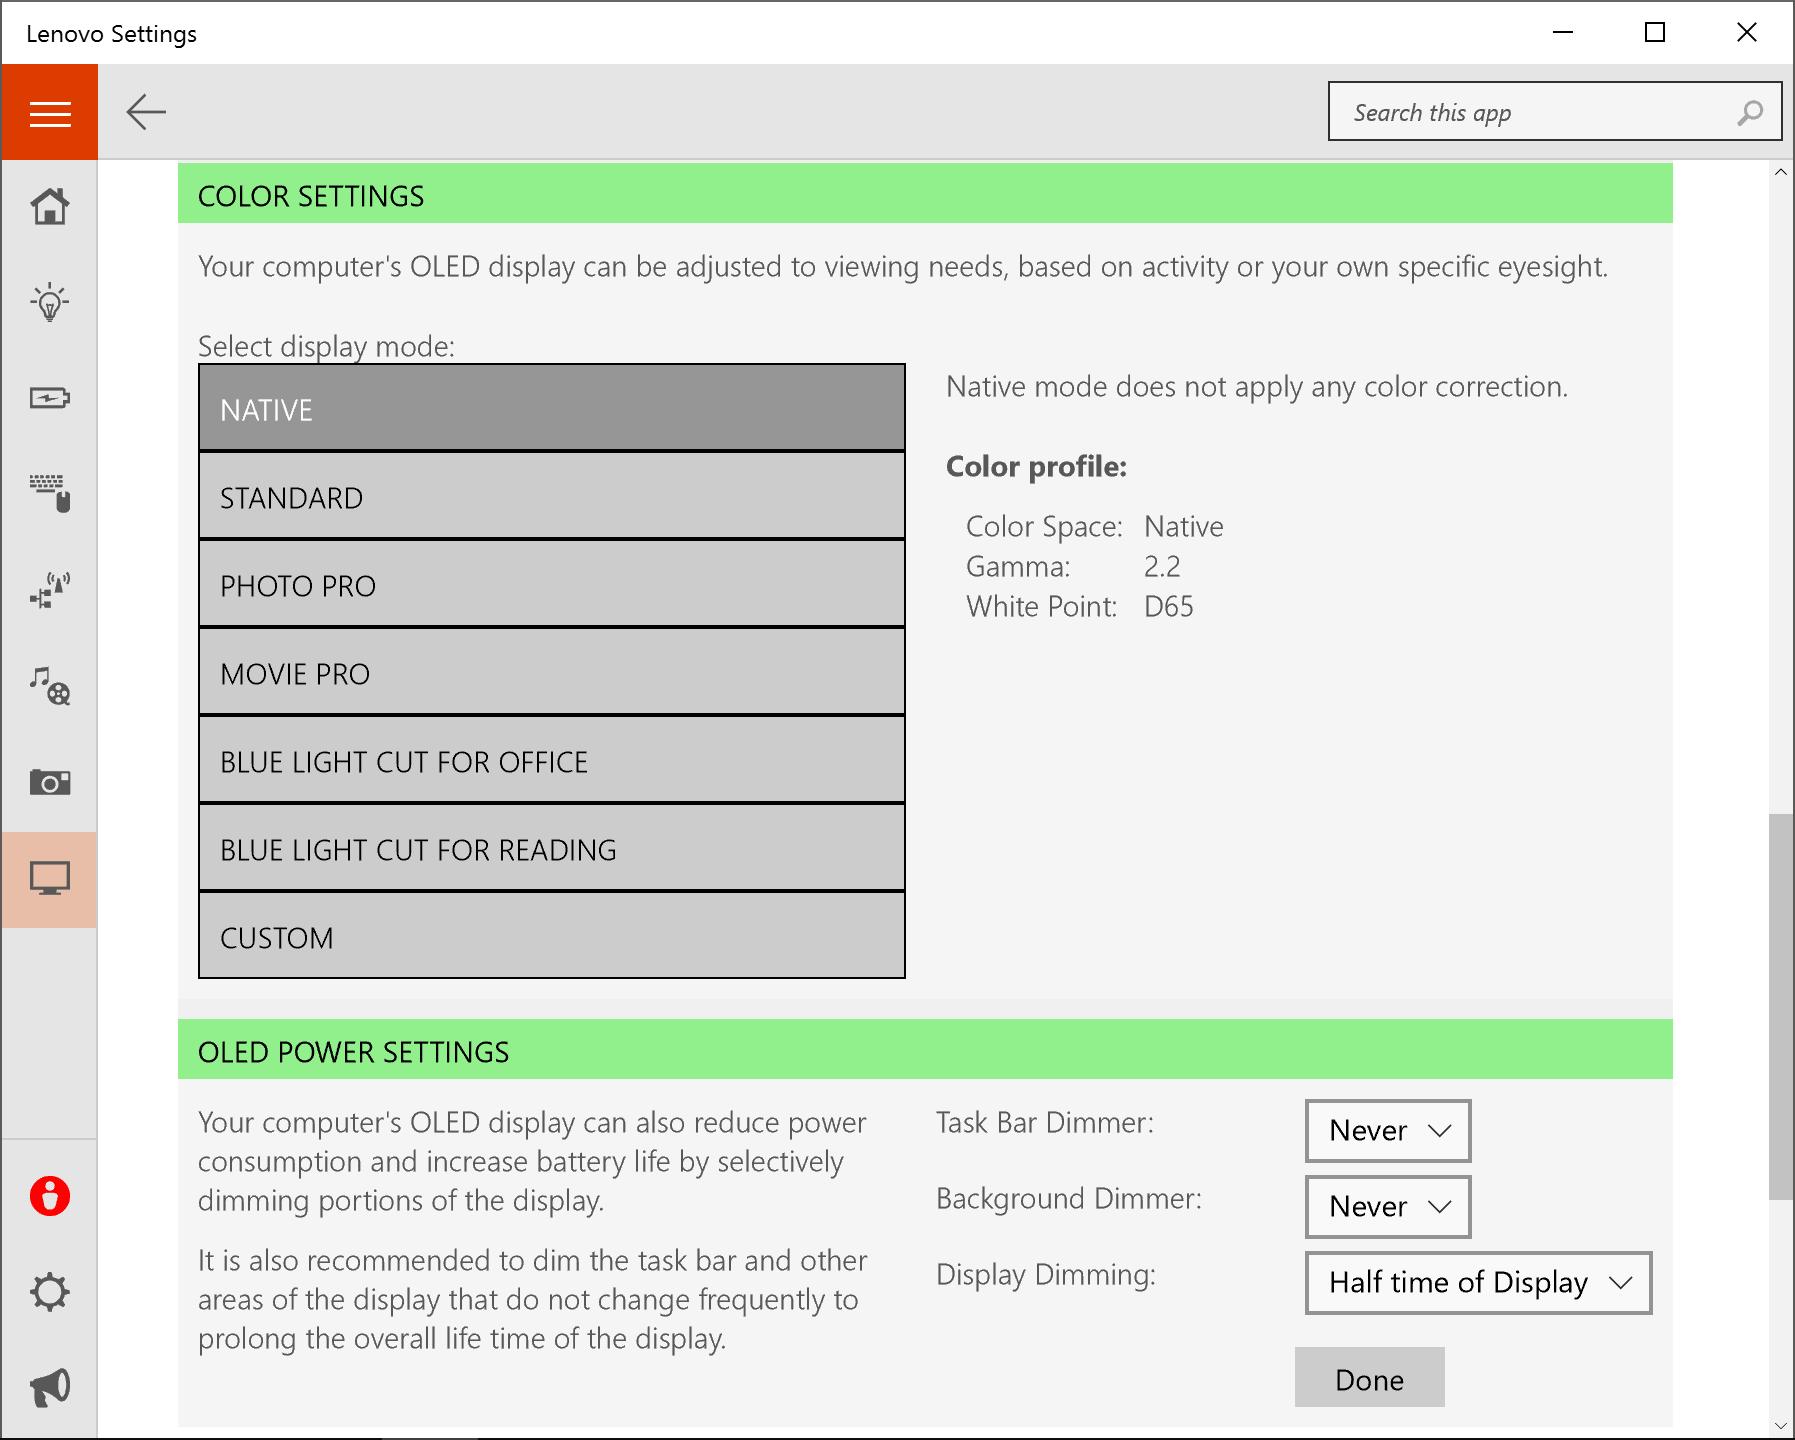 Lenovo ThinkPad X1 Yoga Long-Term Review - OLED is AMAZING